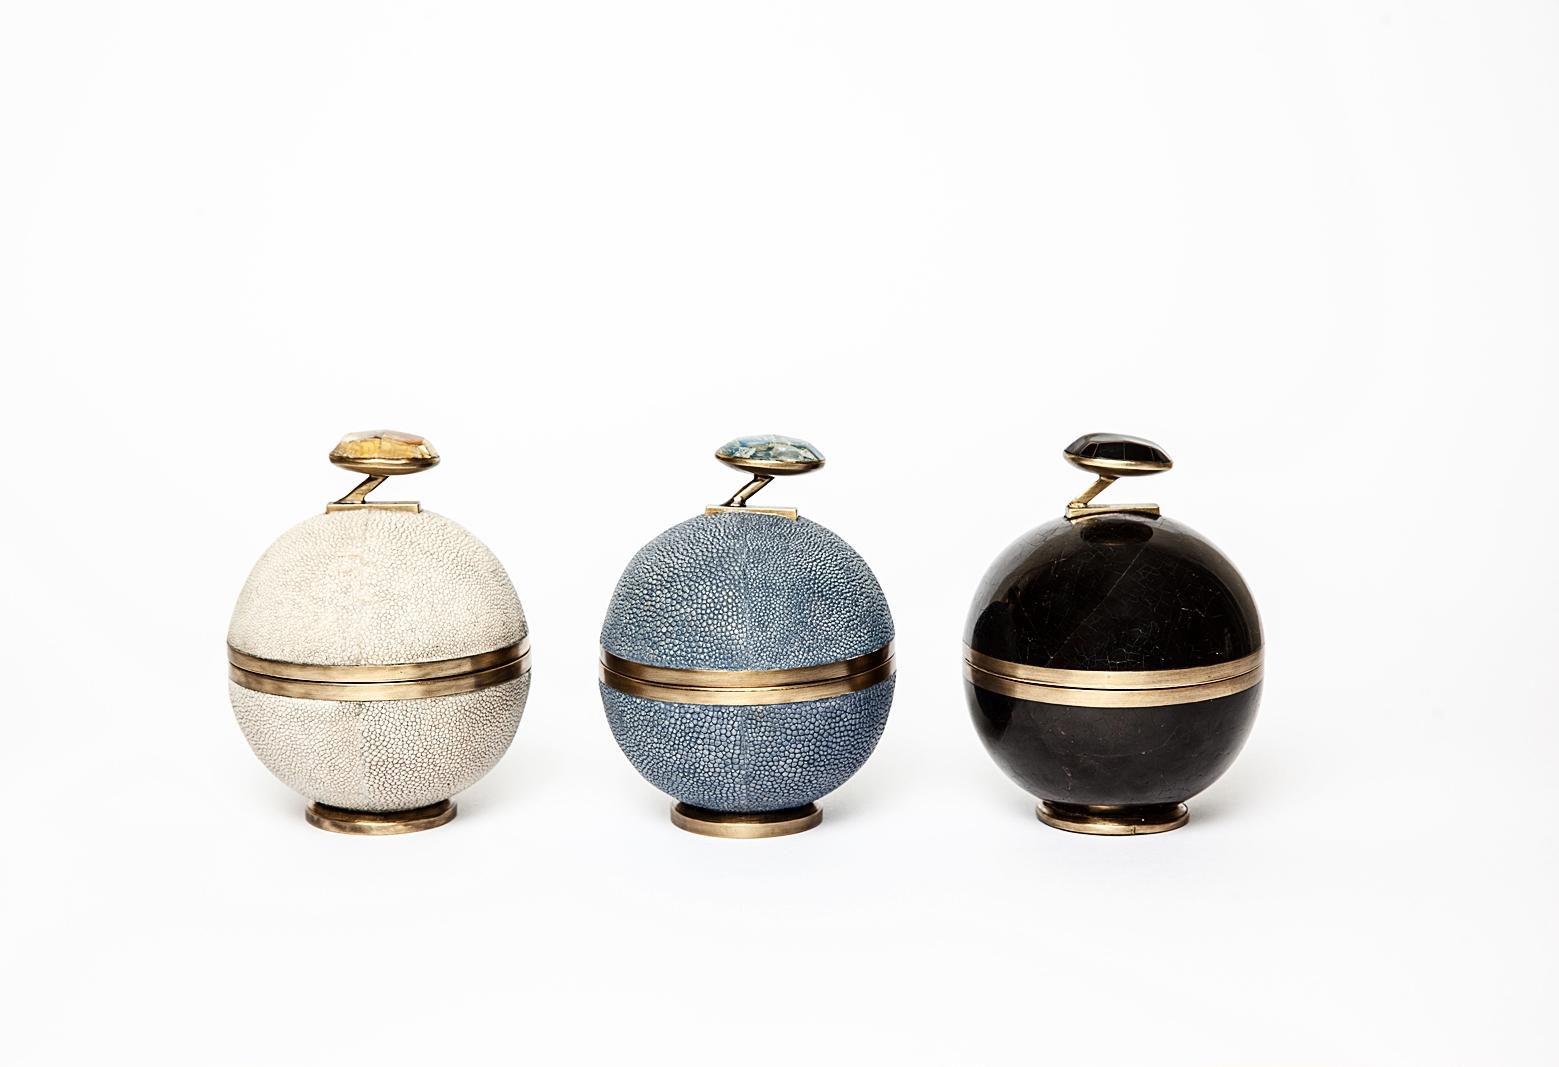 kifu-paris-cannisters-stone-shagreen-brass-black-penshell-shell